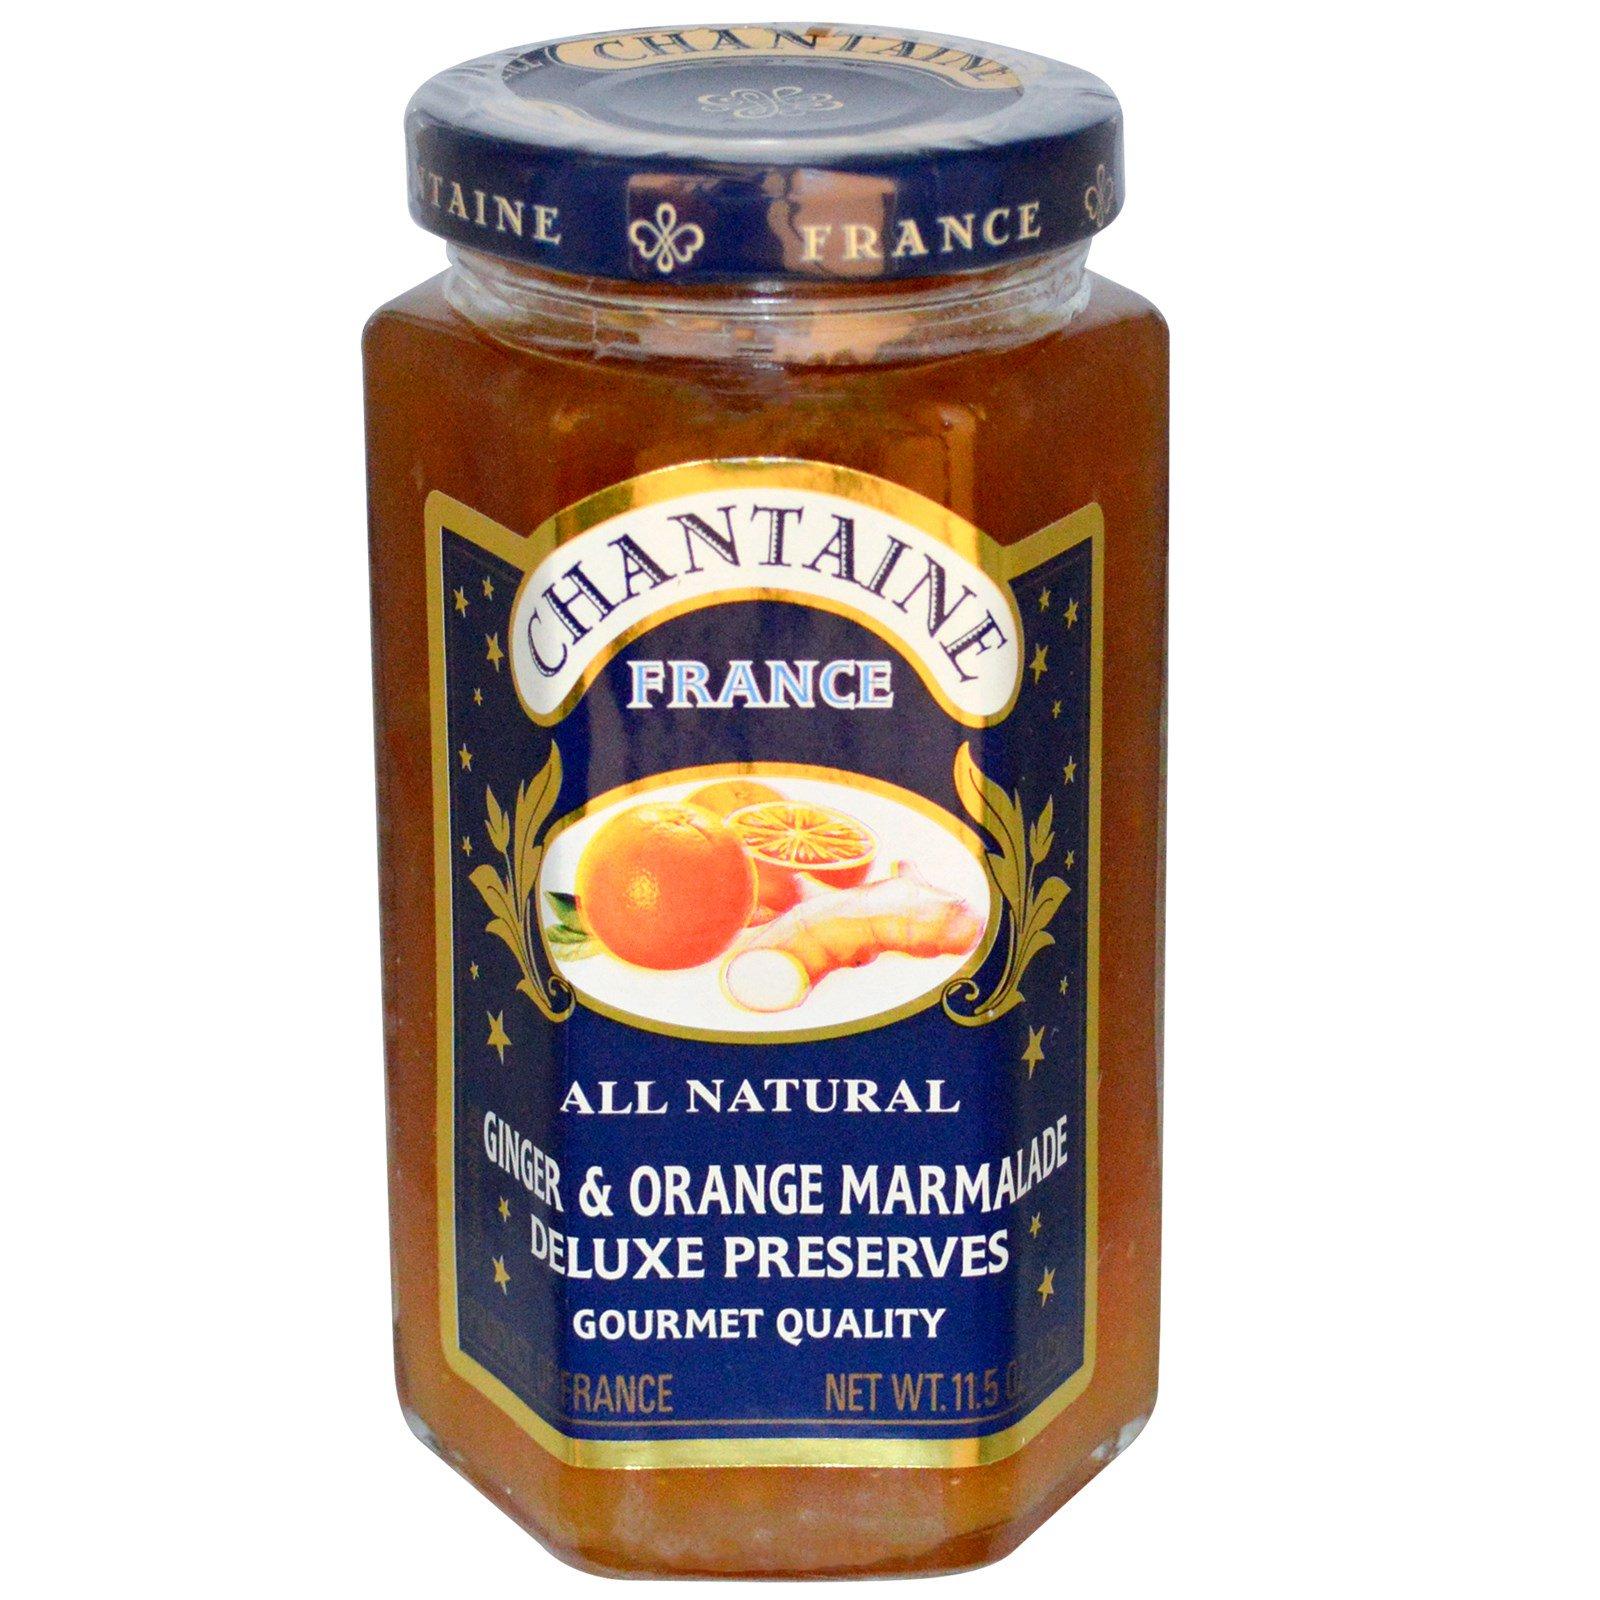 Chantaine, Пресервы люкс, имбирно-апельсиновый мармелад, 11,5 унции (325 г)